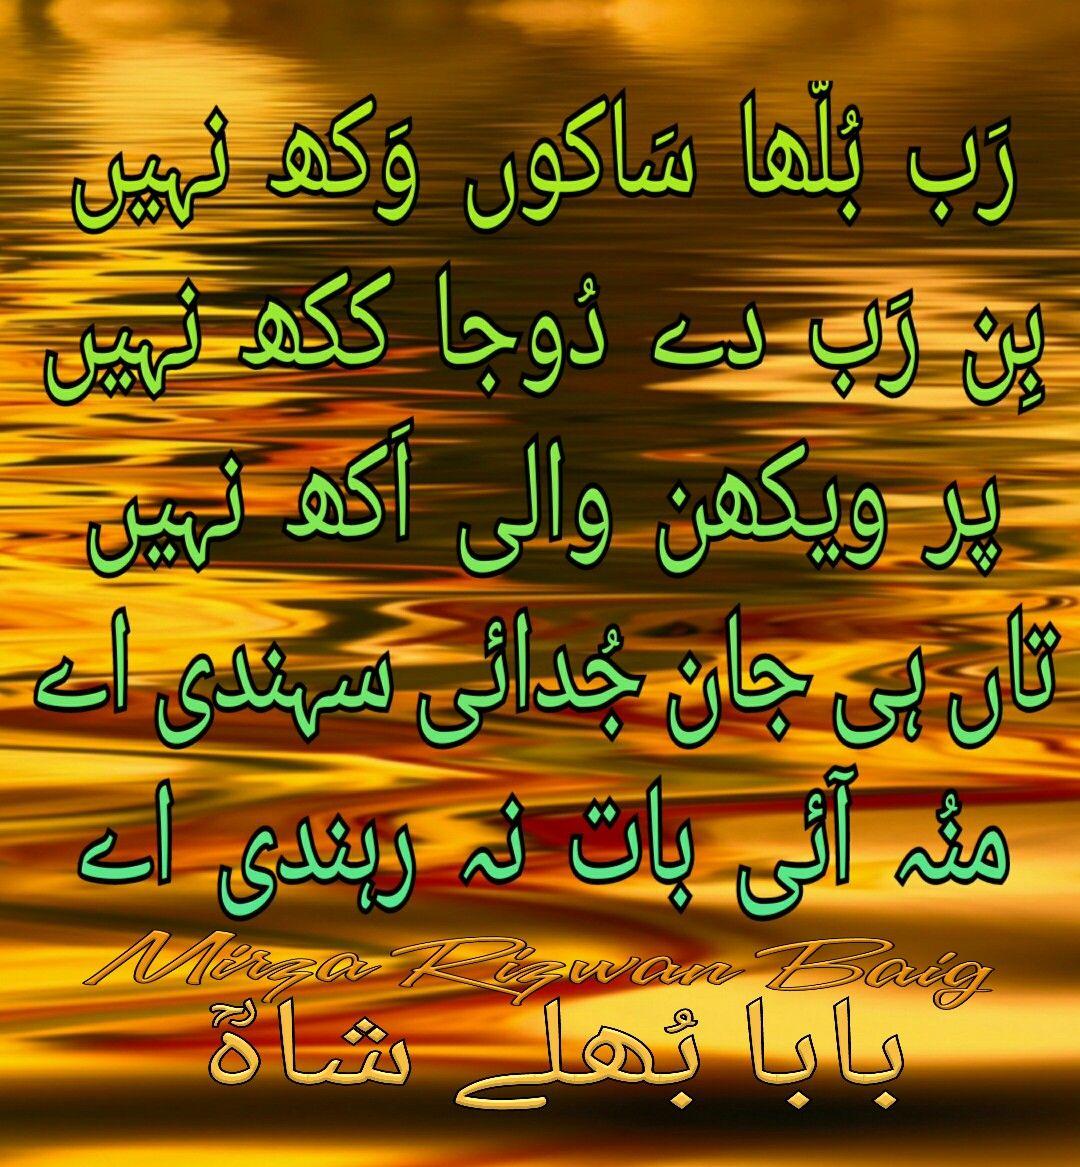 M.R.B BaBa Bulleh Shah بابا بھلے شاہؒ (With images ...